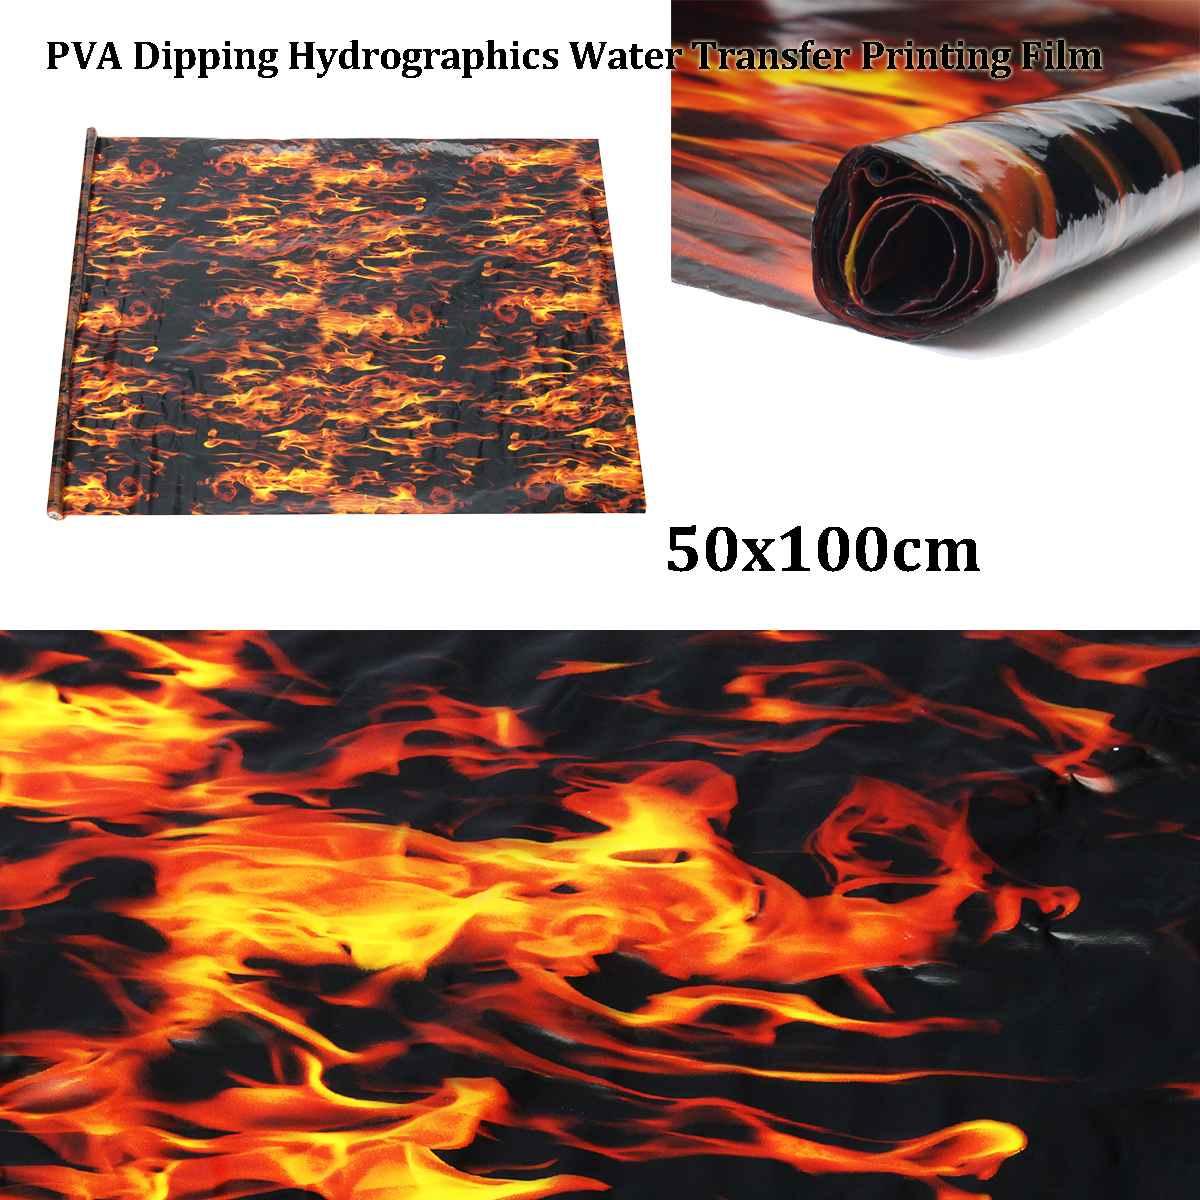 50x100cm Water Transfer Film Unique Design Hydrographic PVA Printing Hydro Dipping Films